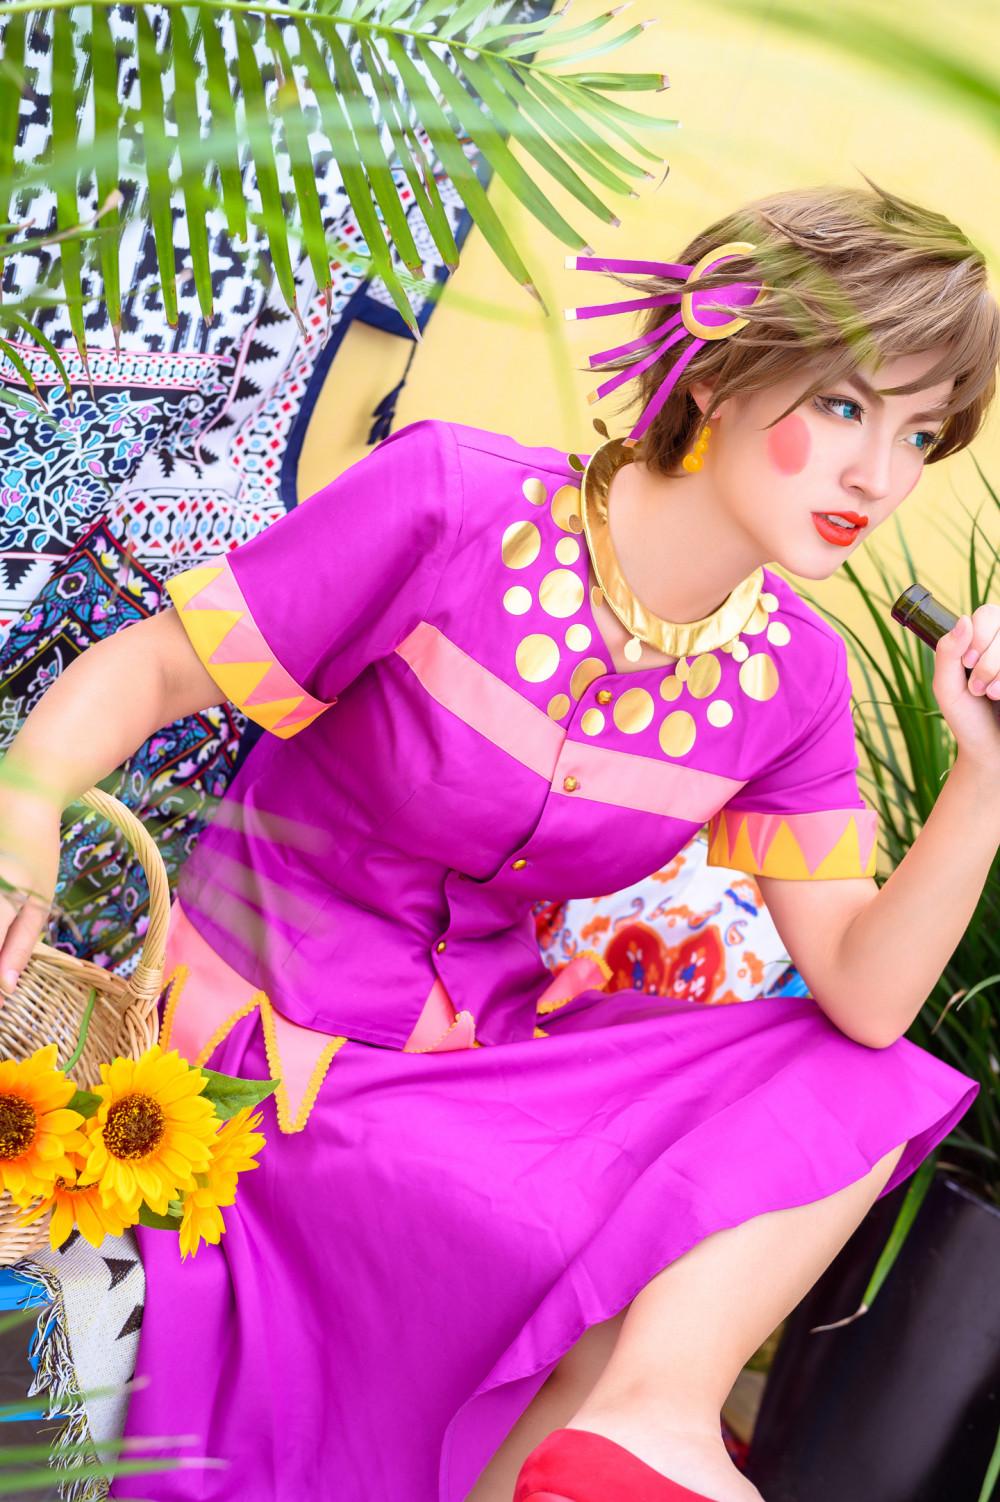 《JoJo的奇妙冒險》女裝佬大龍舌蘭姑娘 6